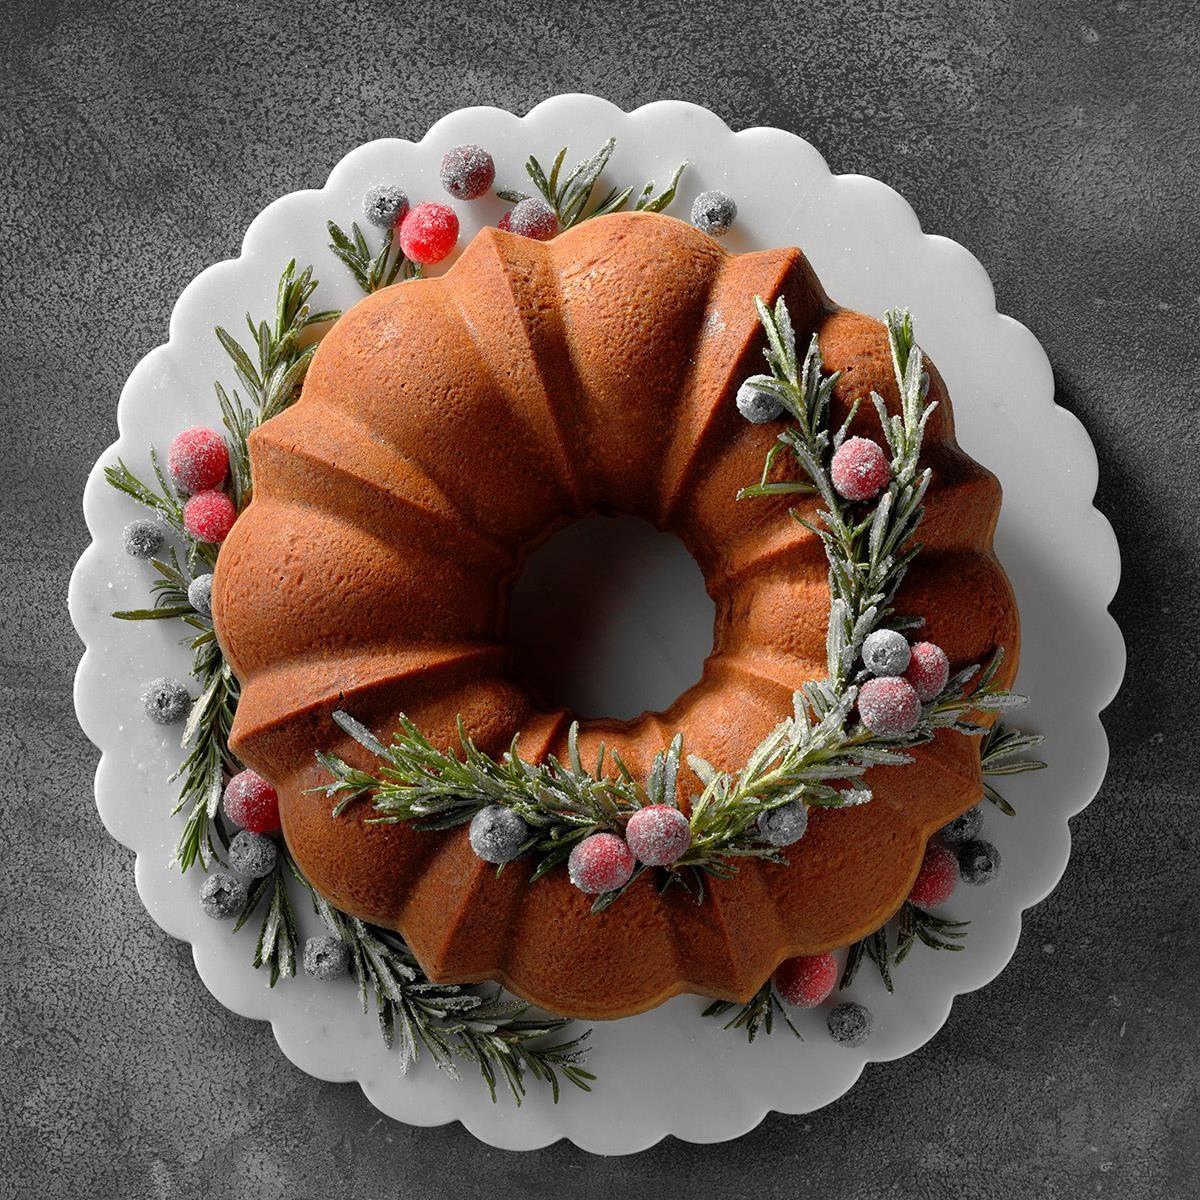 Maryland: Butter Pound Cake